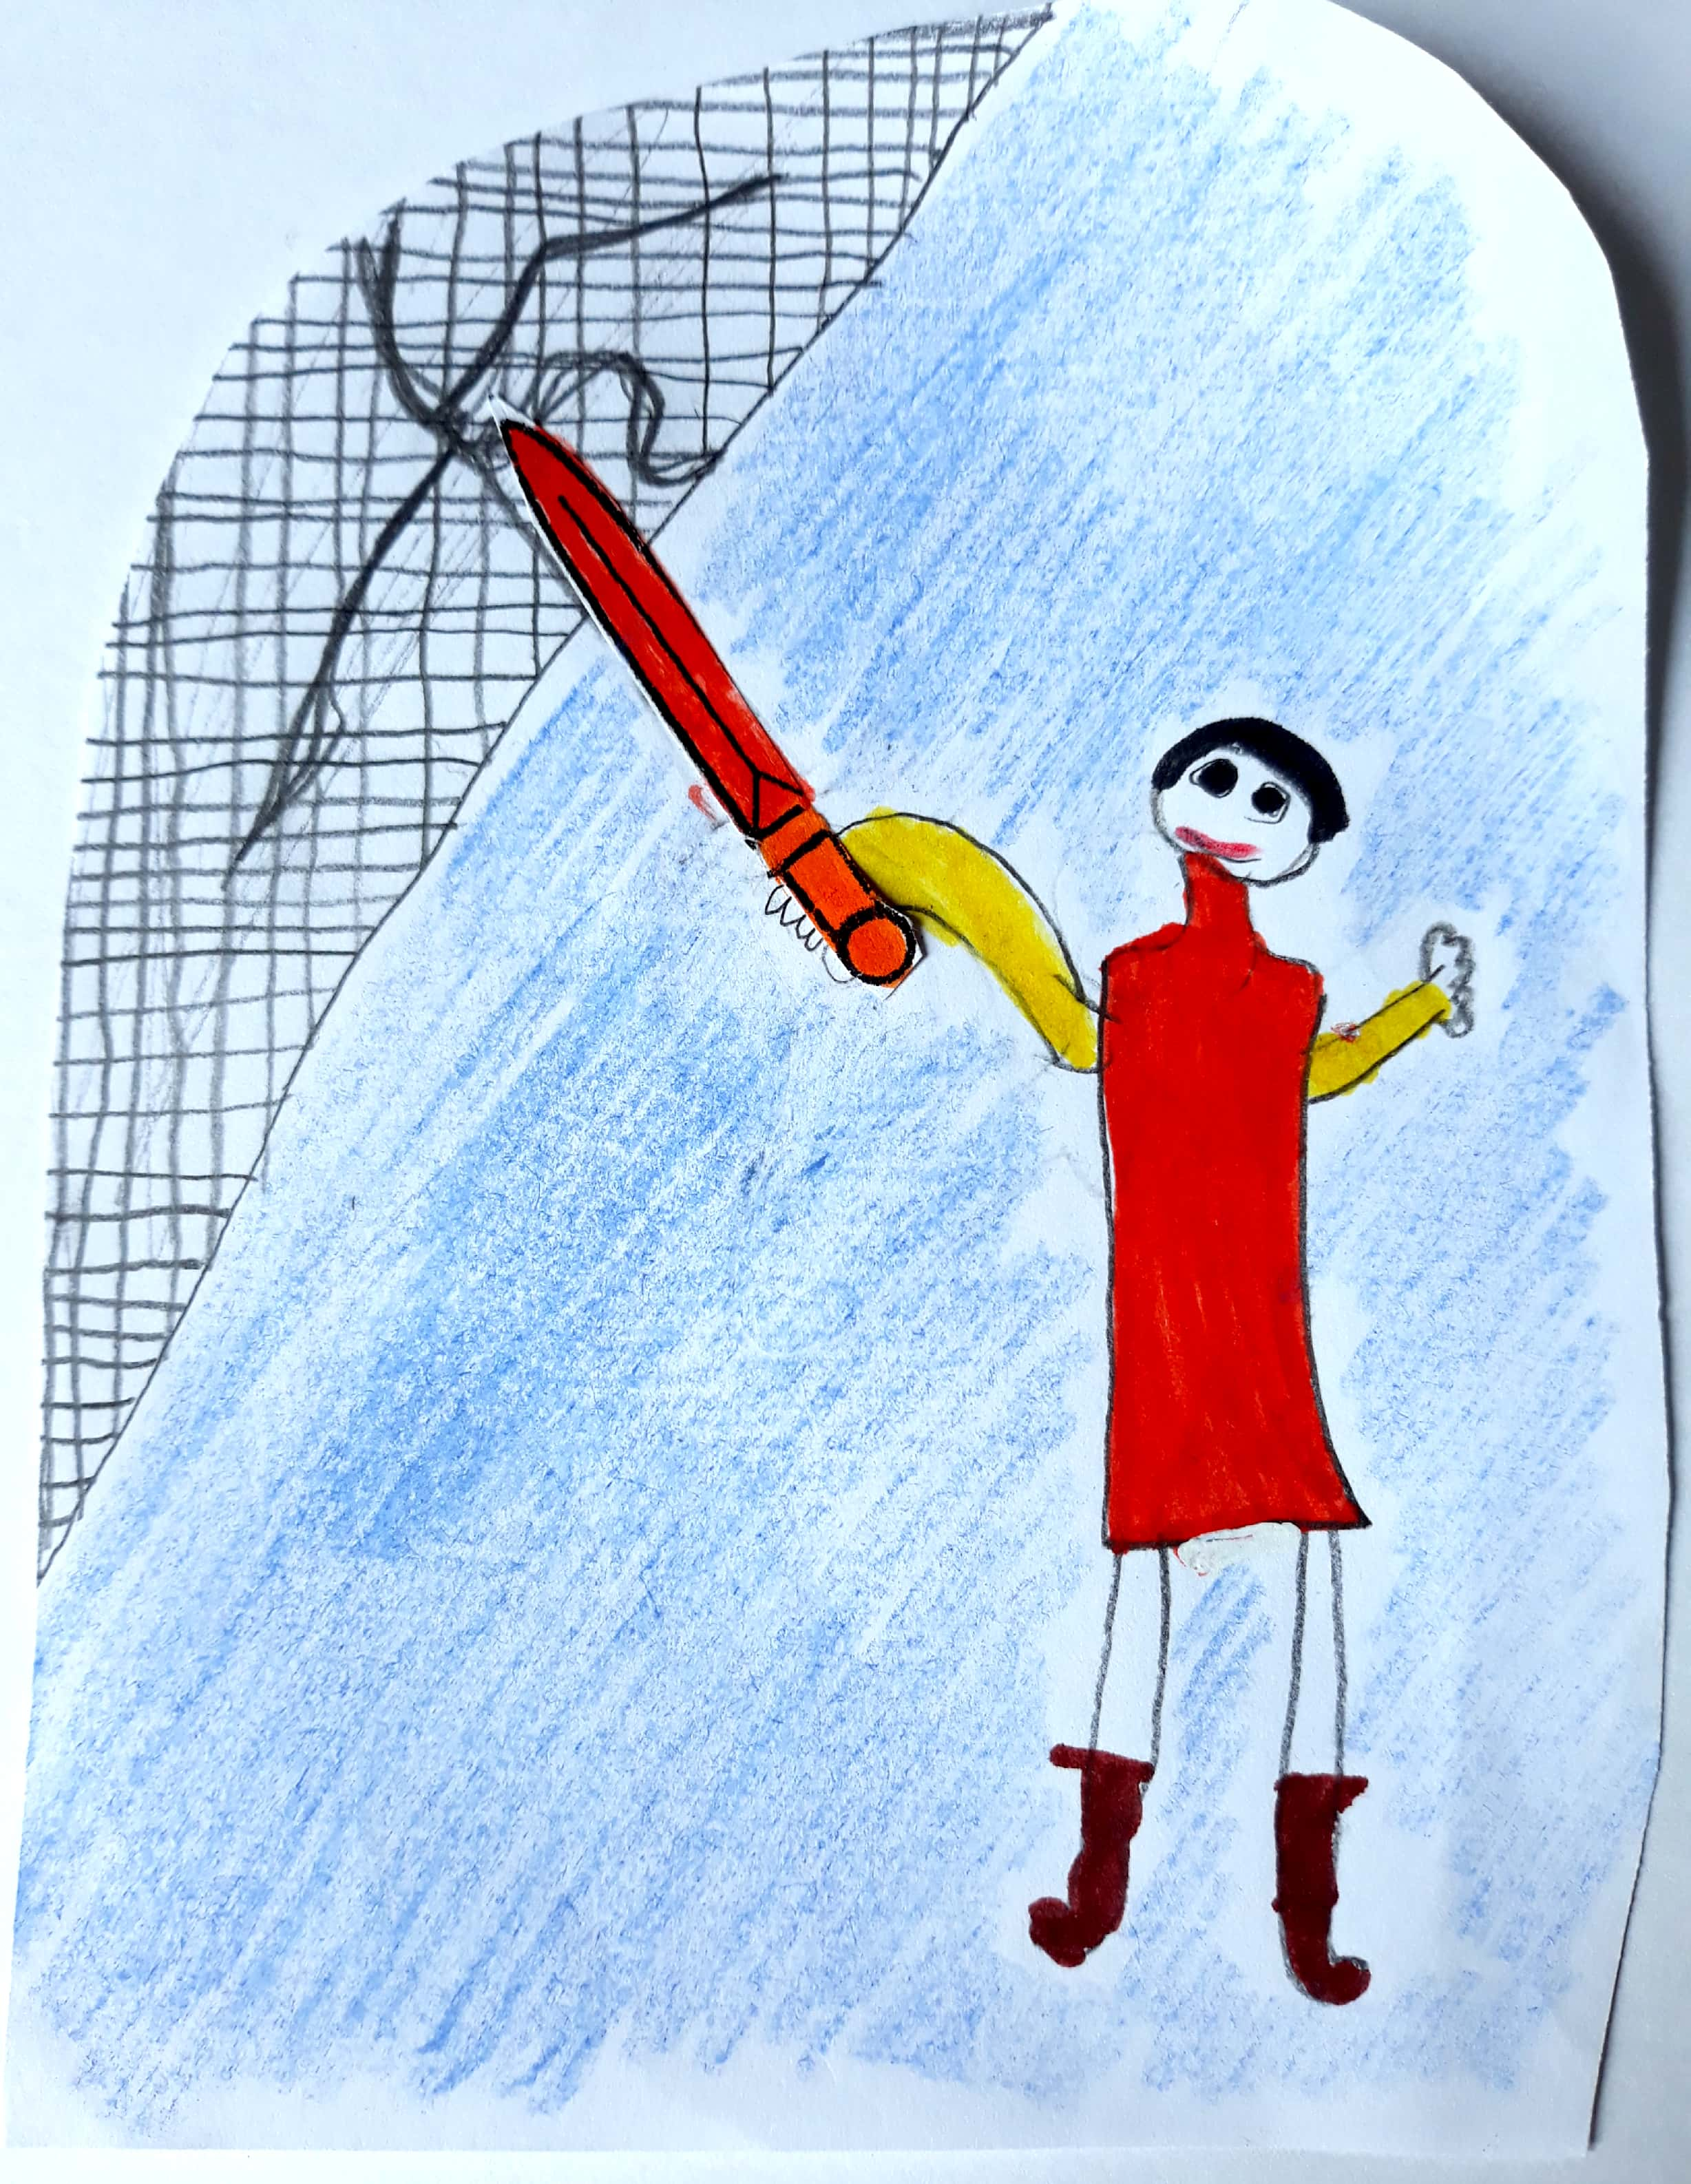 Artwork from the book - C'era una volta… by Lucia Addiechi - Ourboox.com